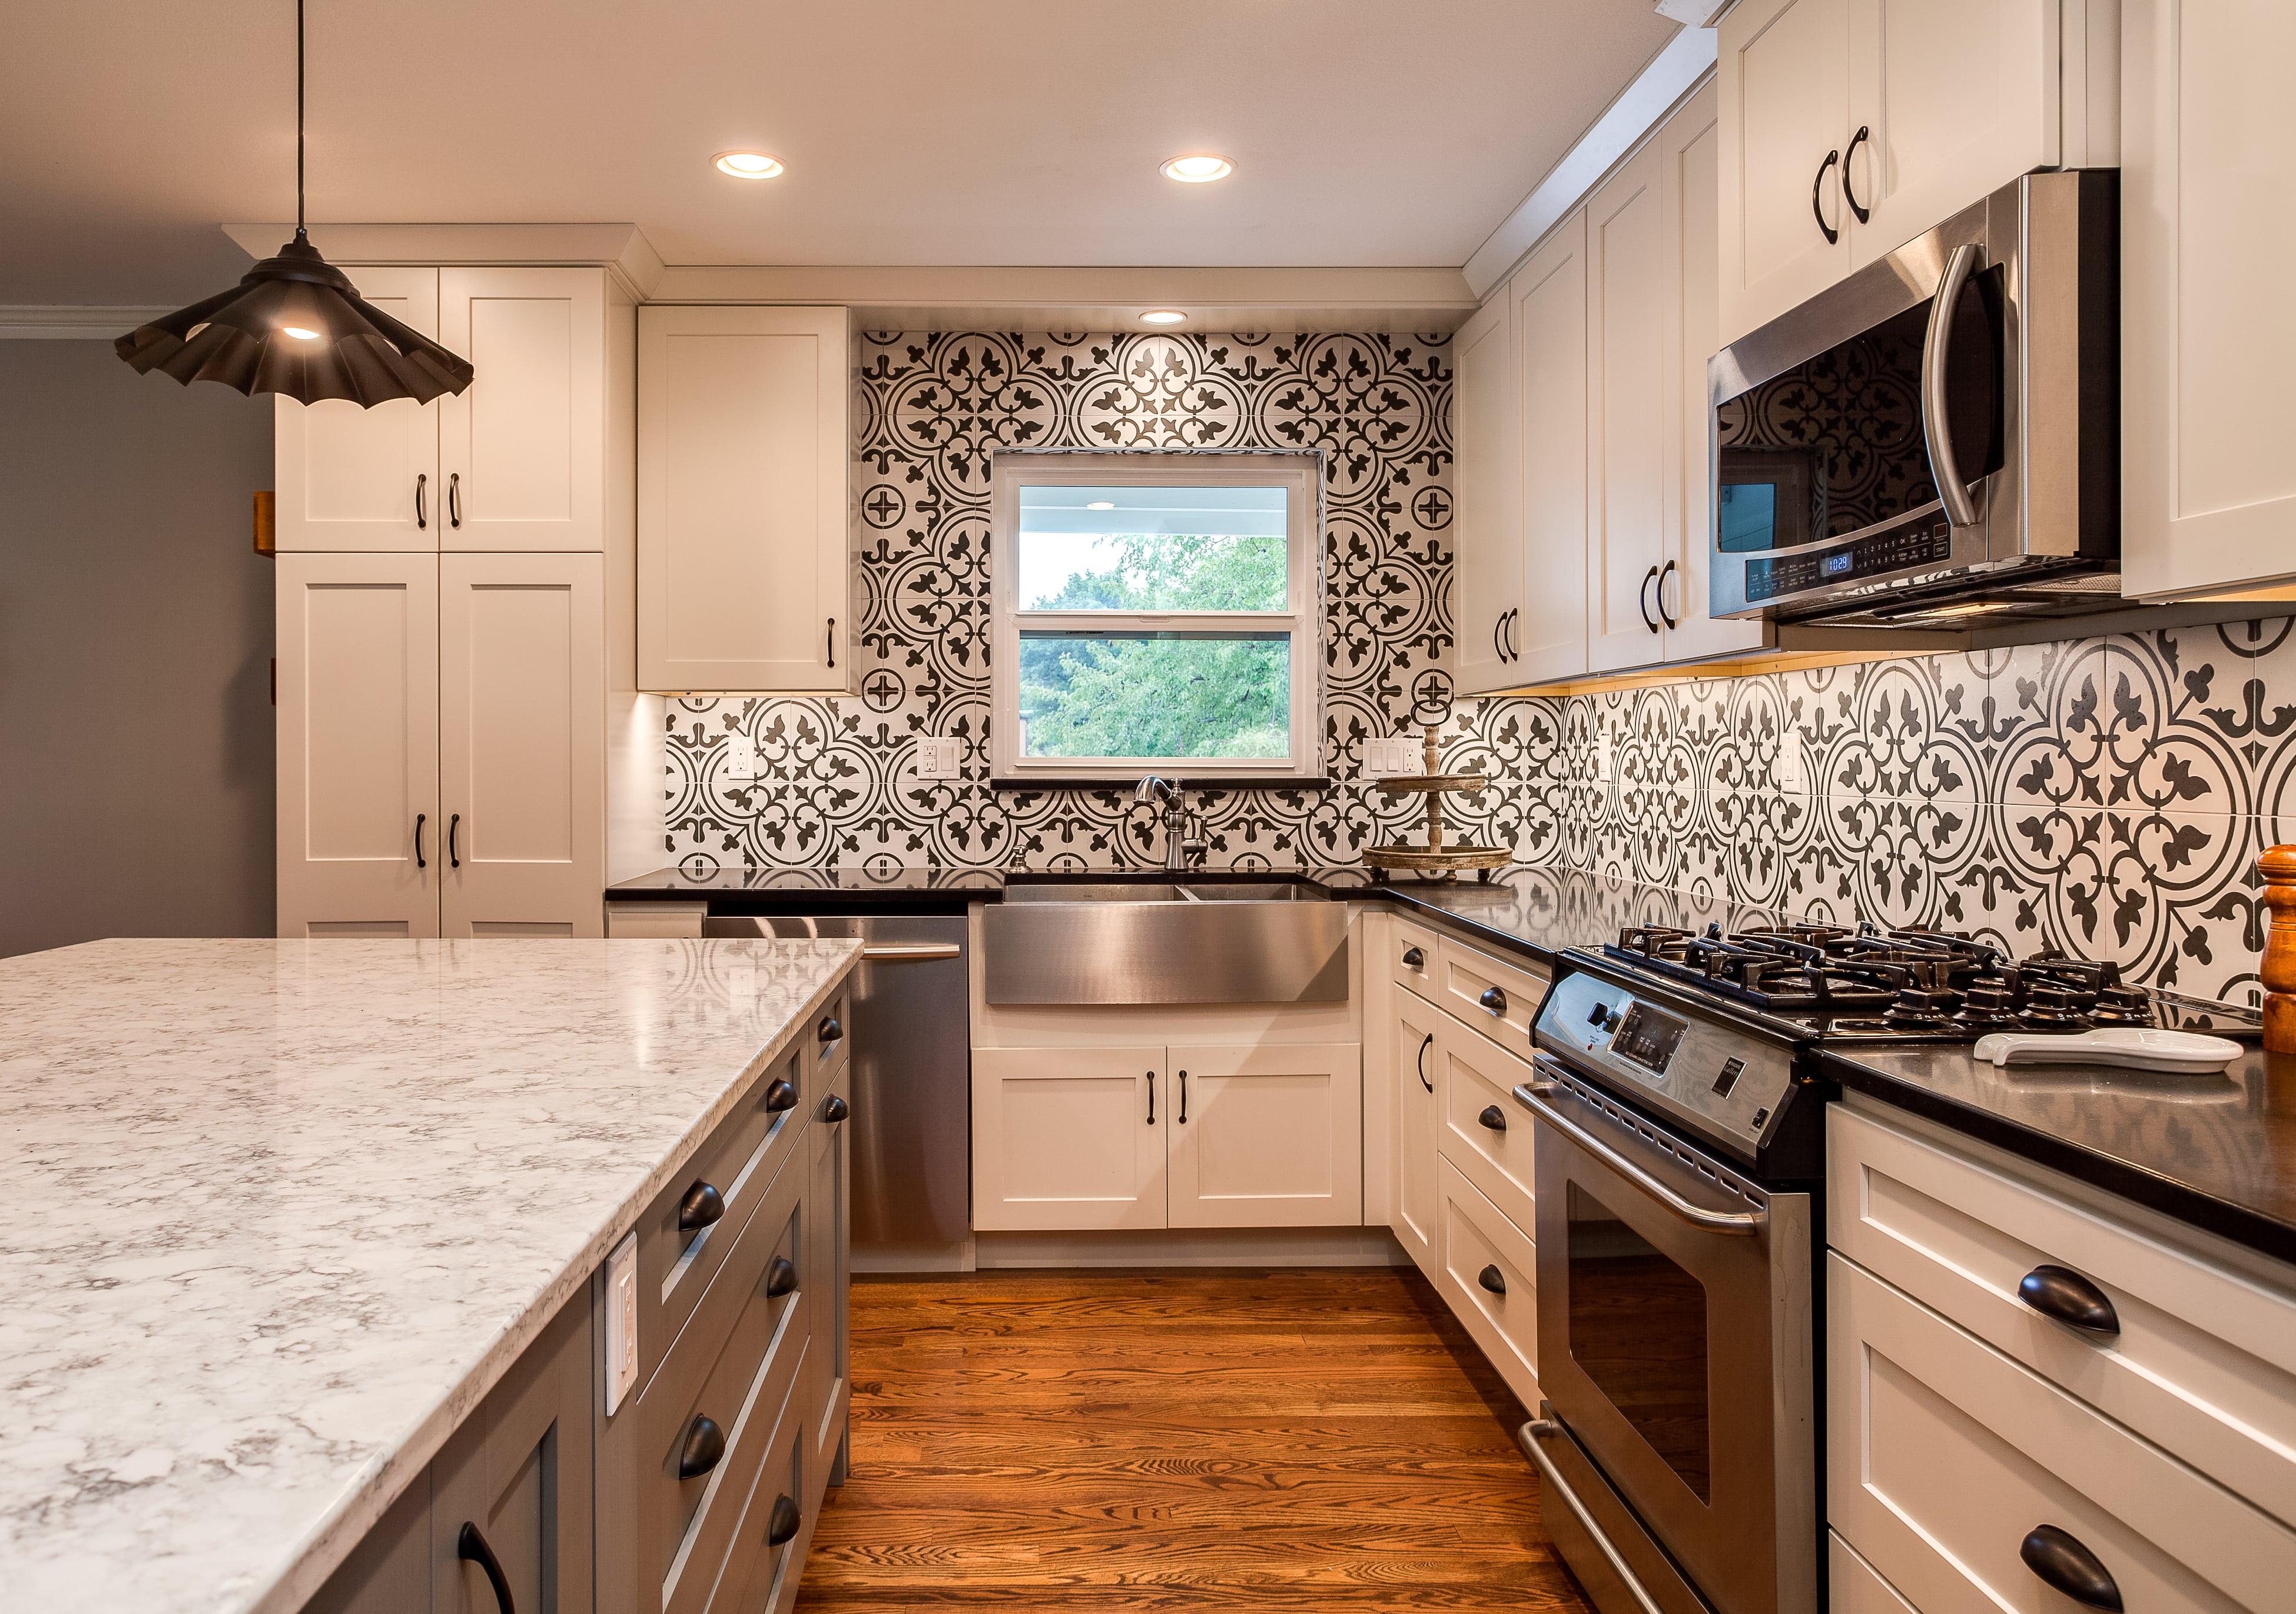 ... White Shaker Cabinet Kitchen With Tile Backsplash ...